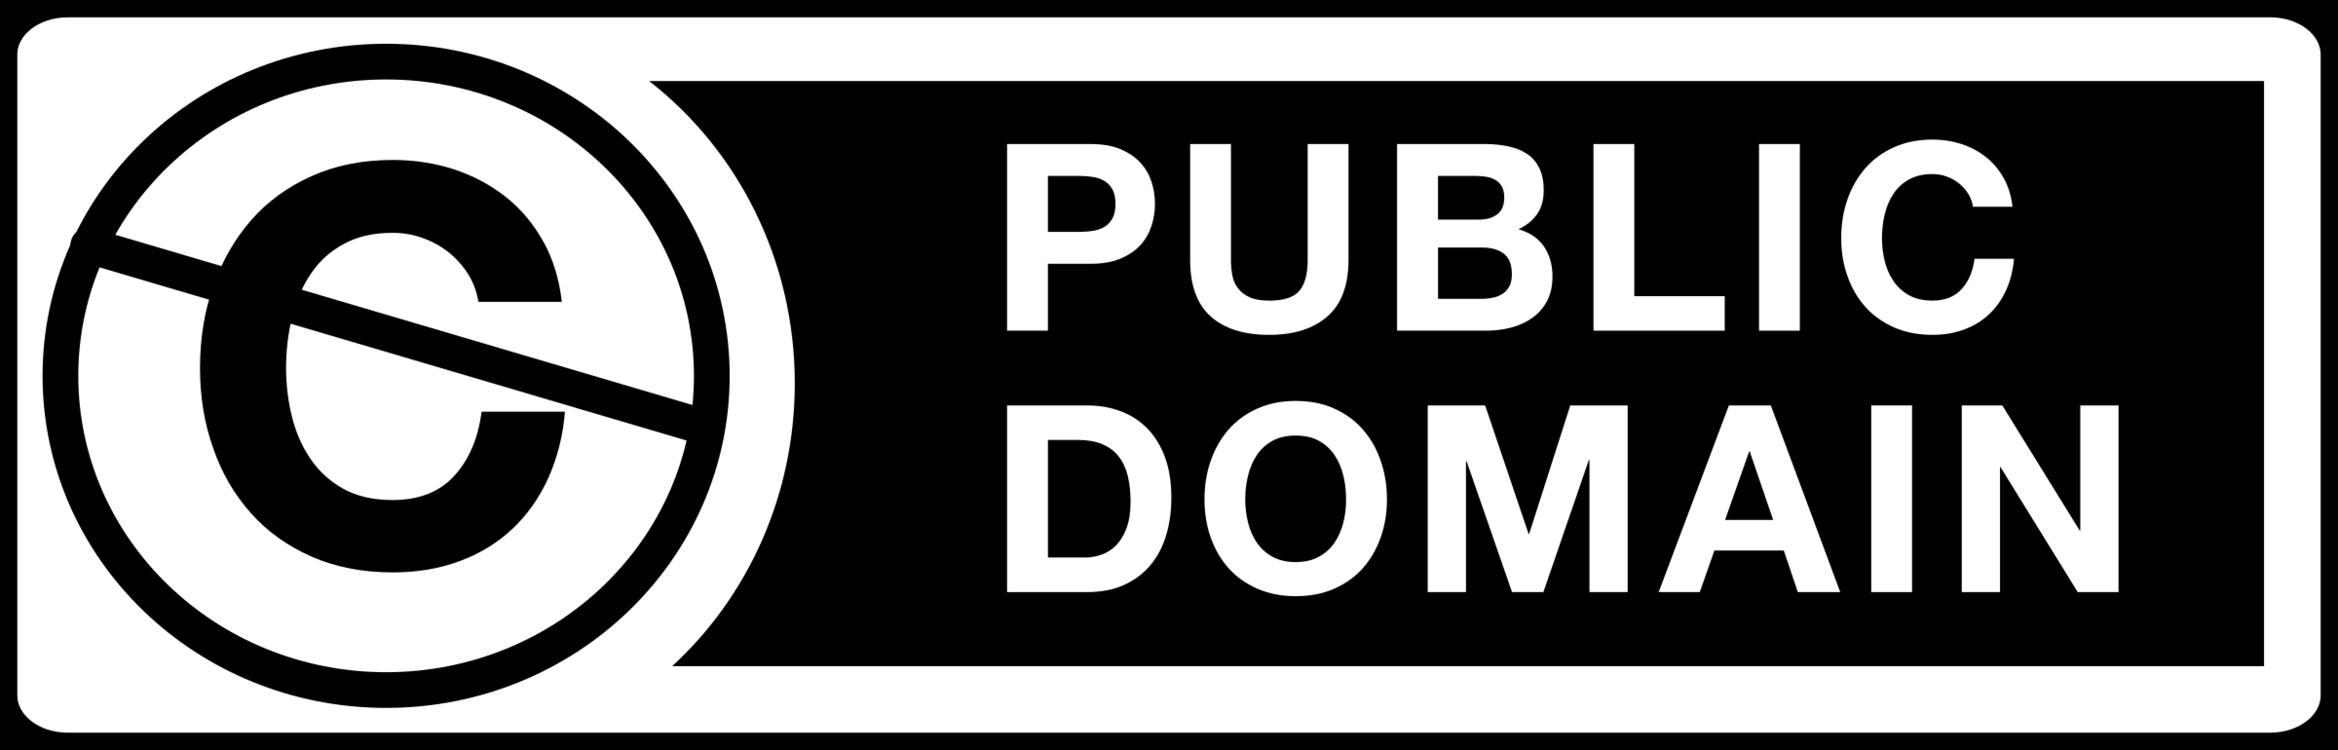 public domain mark logo copyright creative commons license free rh kisscc0 com clipart public domain clip art public domain for commercial use